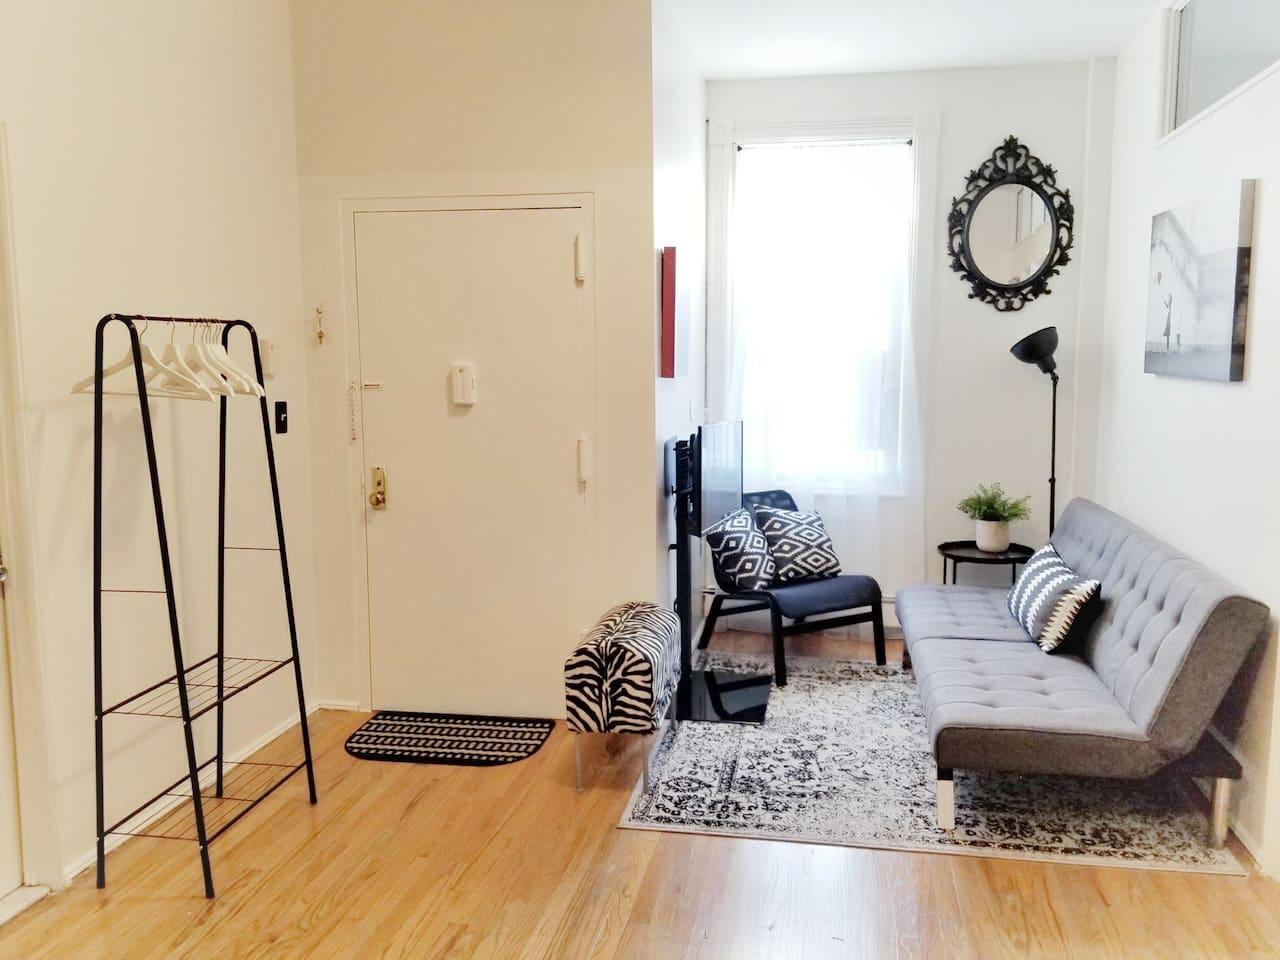 Entrance & Living Room (sofa bed)